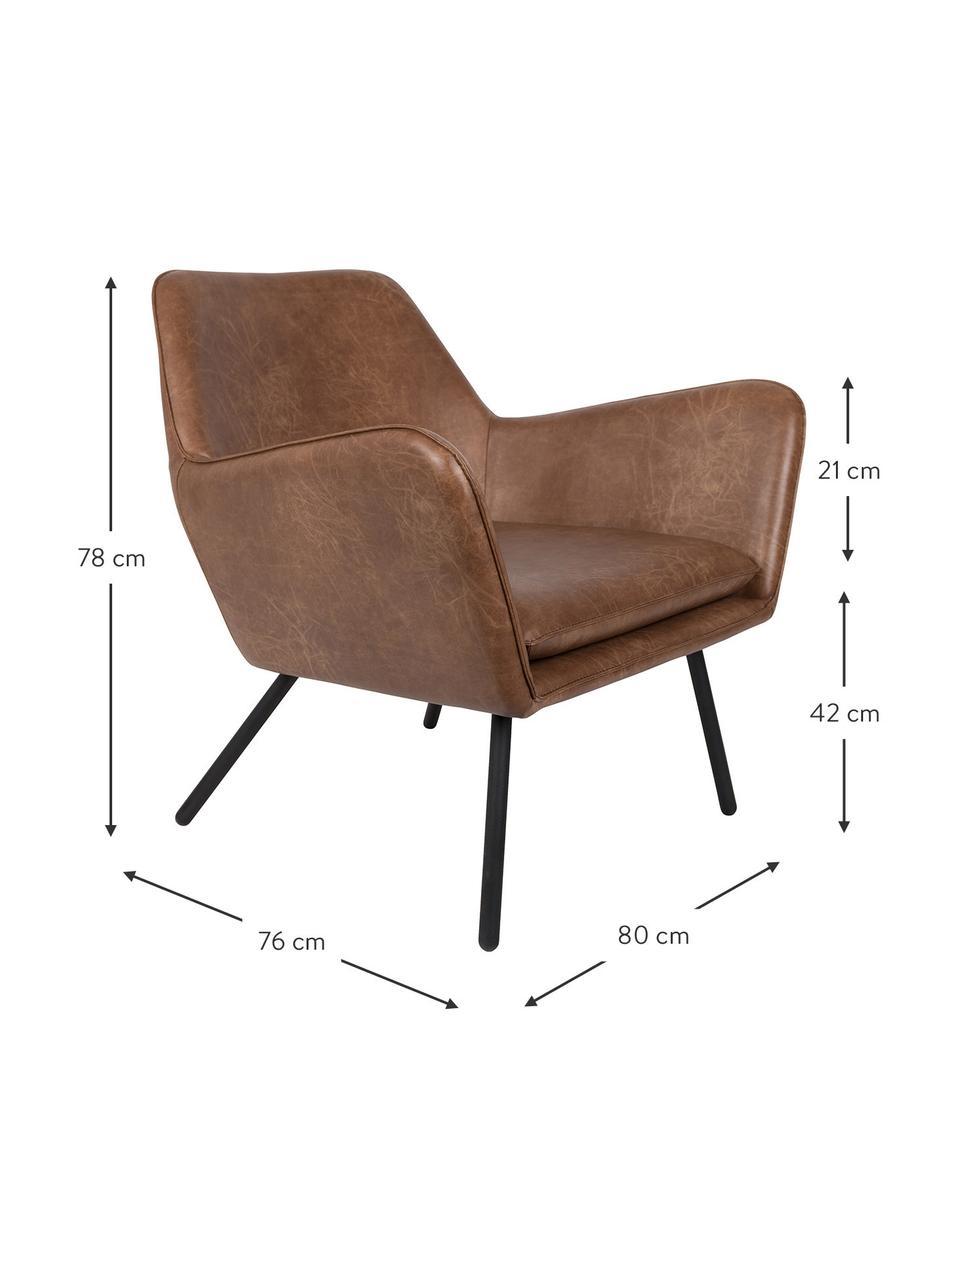 Fauteuil lounge cuir synthétique Bon, Cuir synthétique brun